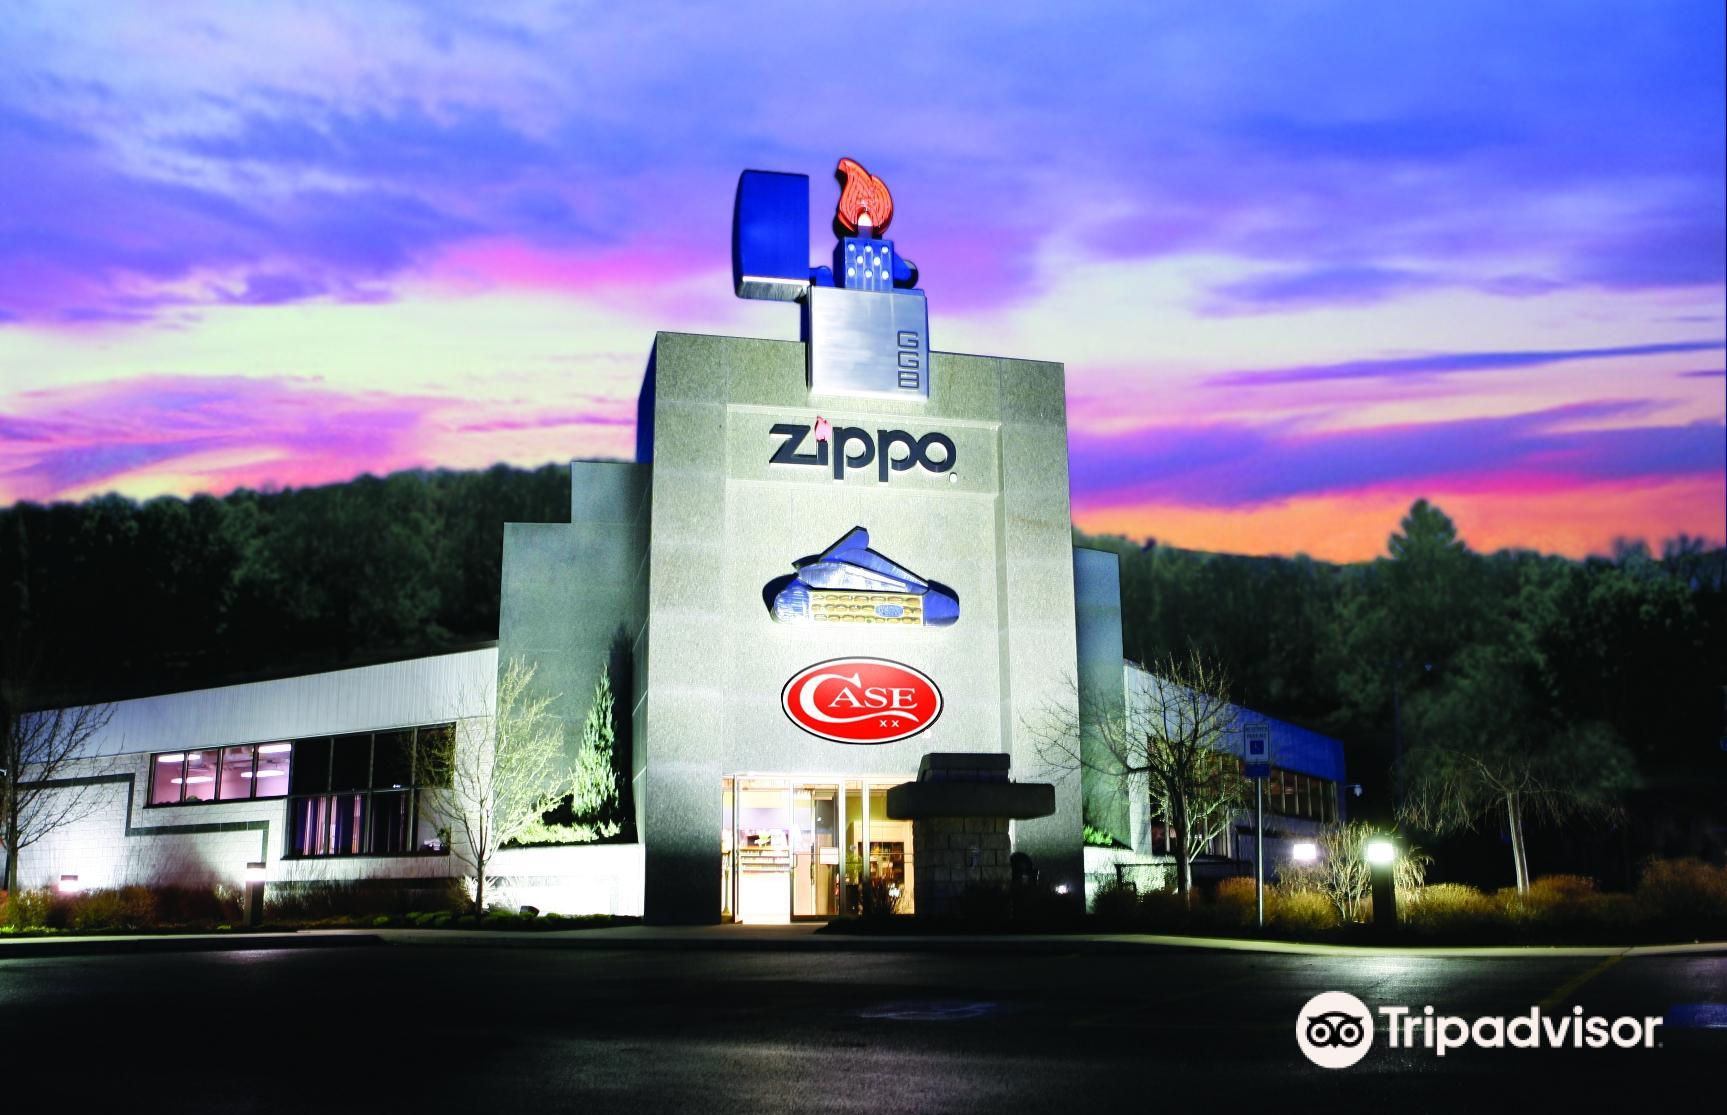 Zippo / Case Museum